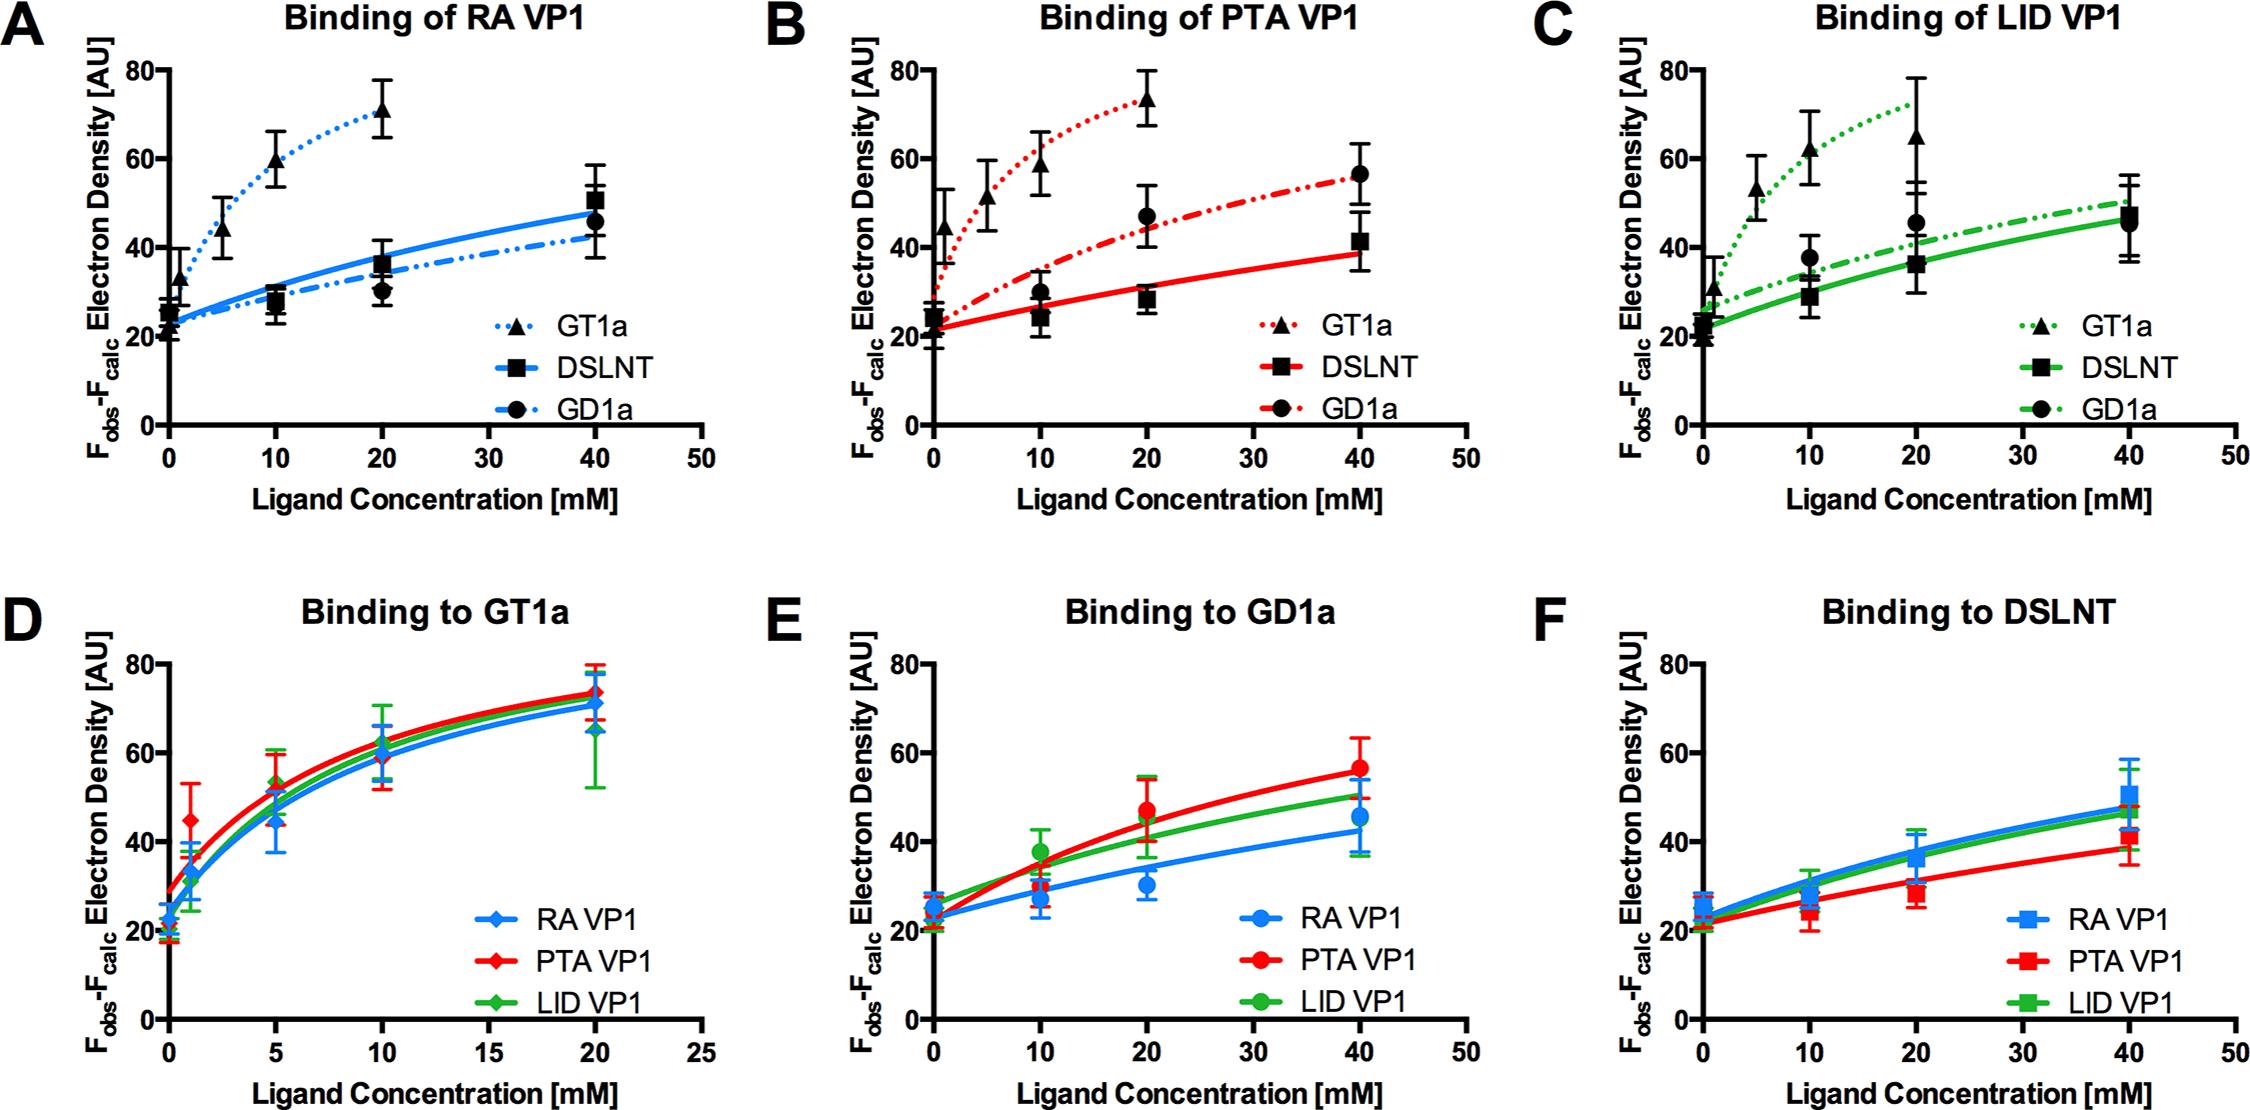 Binding of ligands to MuPyV VP1.